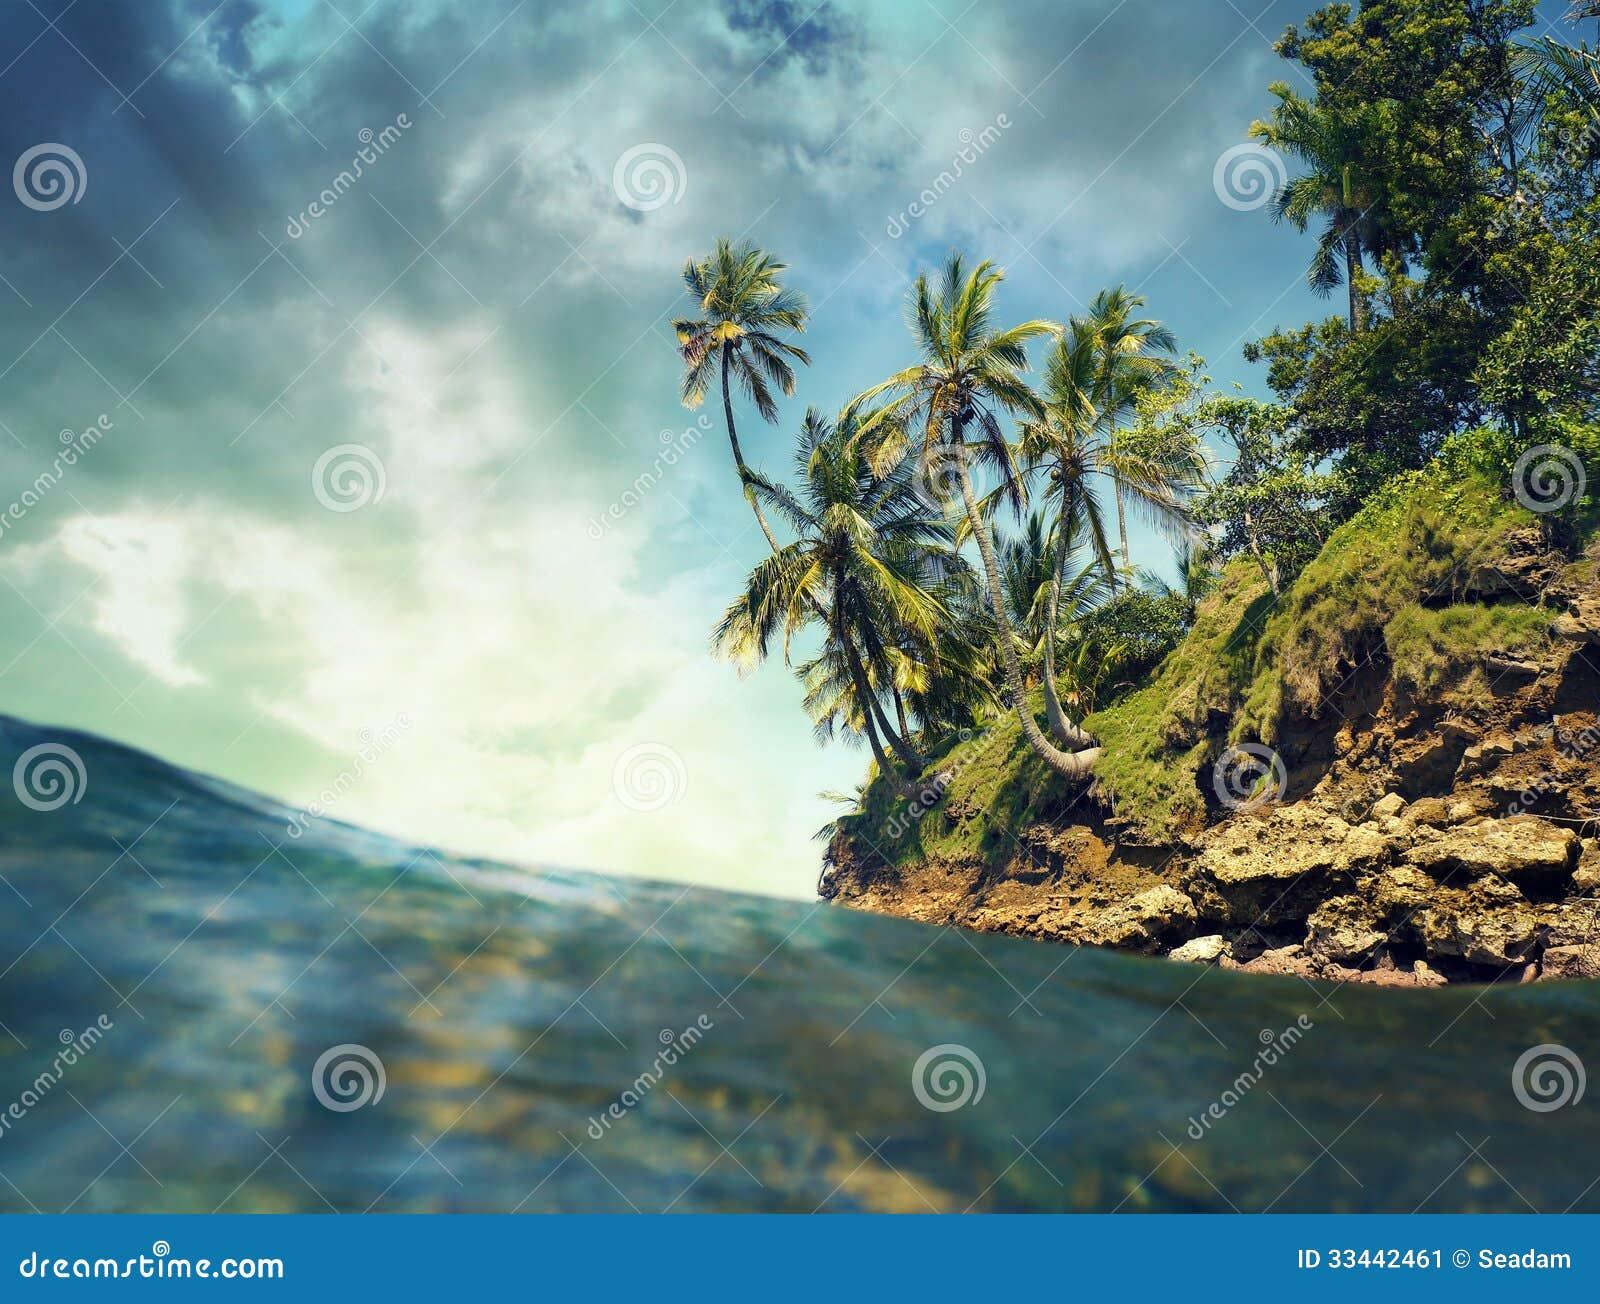 Arbres de noix de coco au dessus de la mer image stock image 33442461 - Arbre noix de coco ...